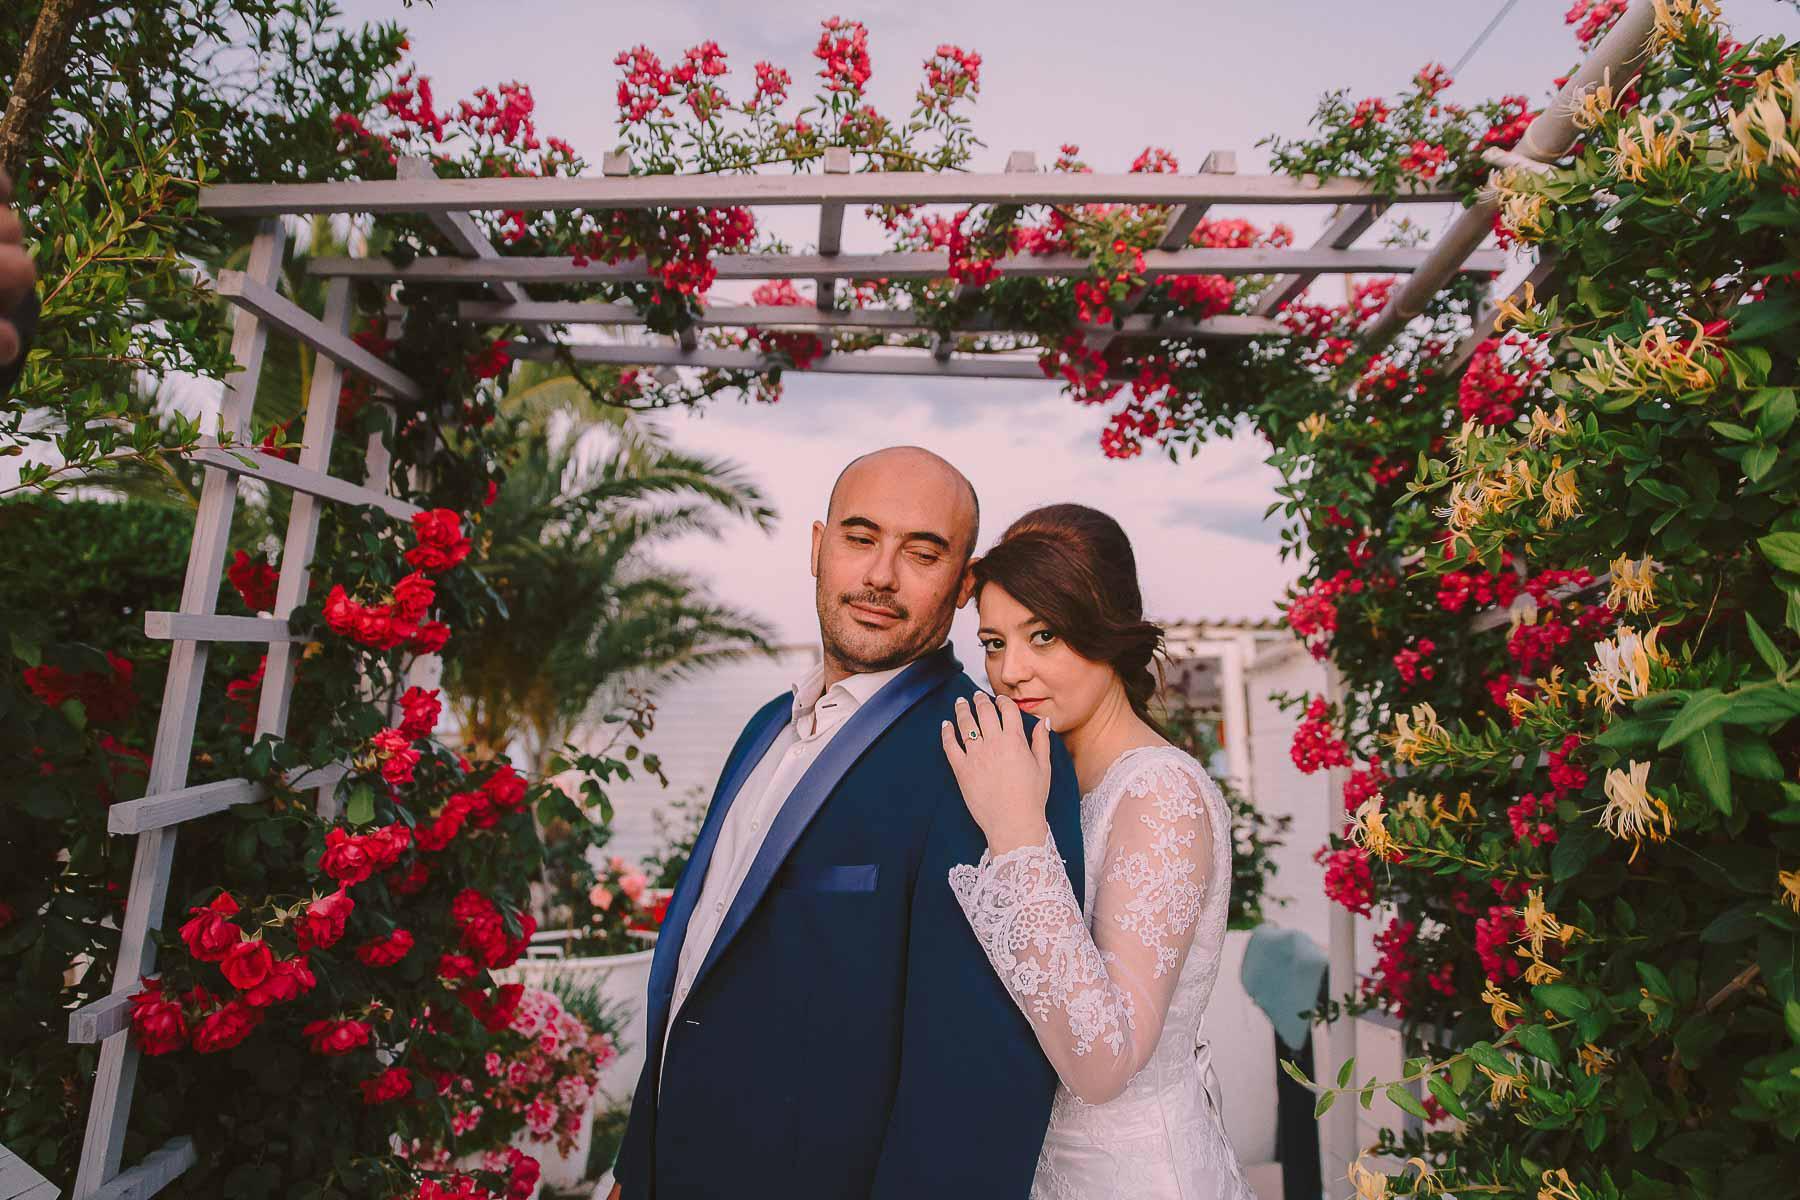 destination-wedding-in-lake-aitoliko-messolonghi-in-greece101